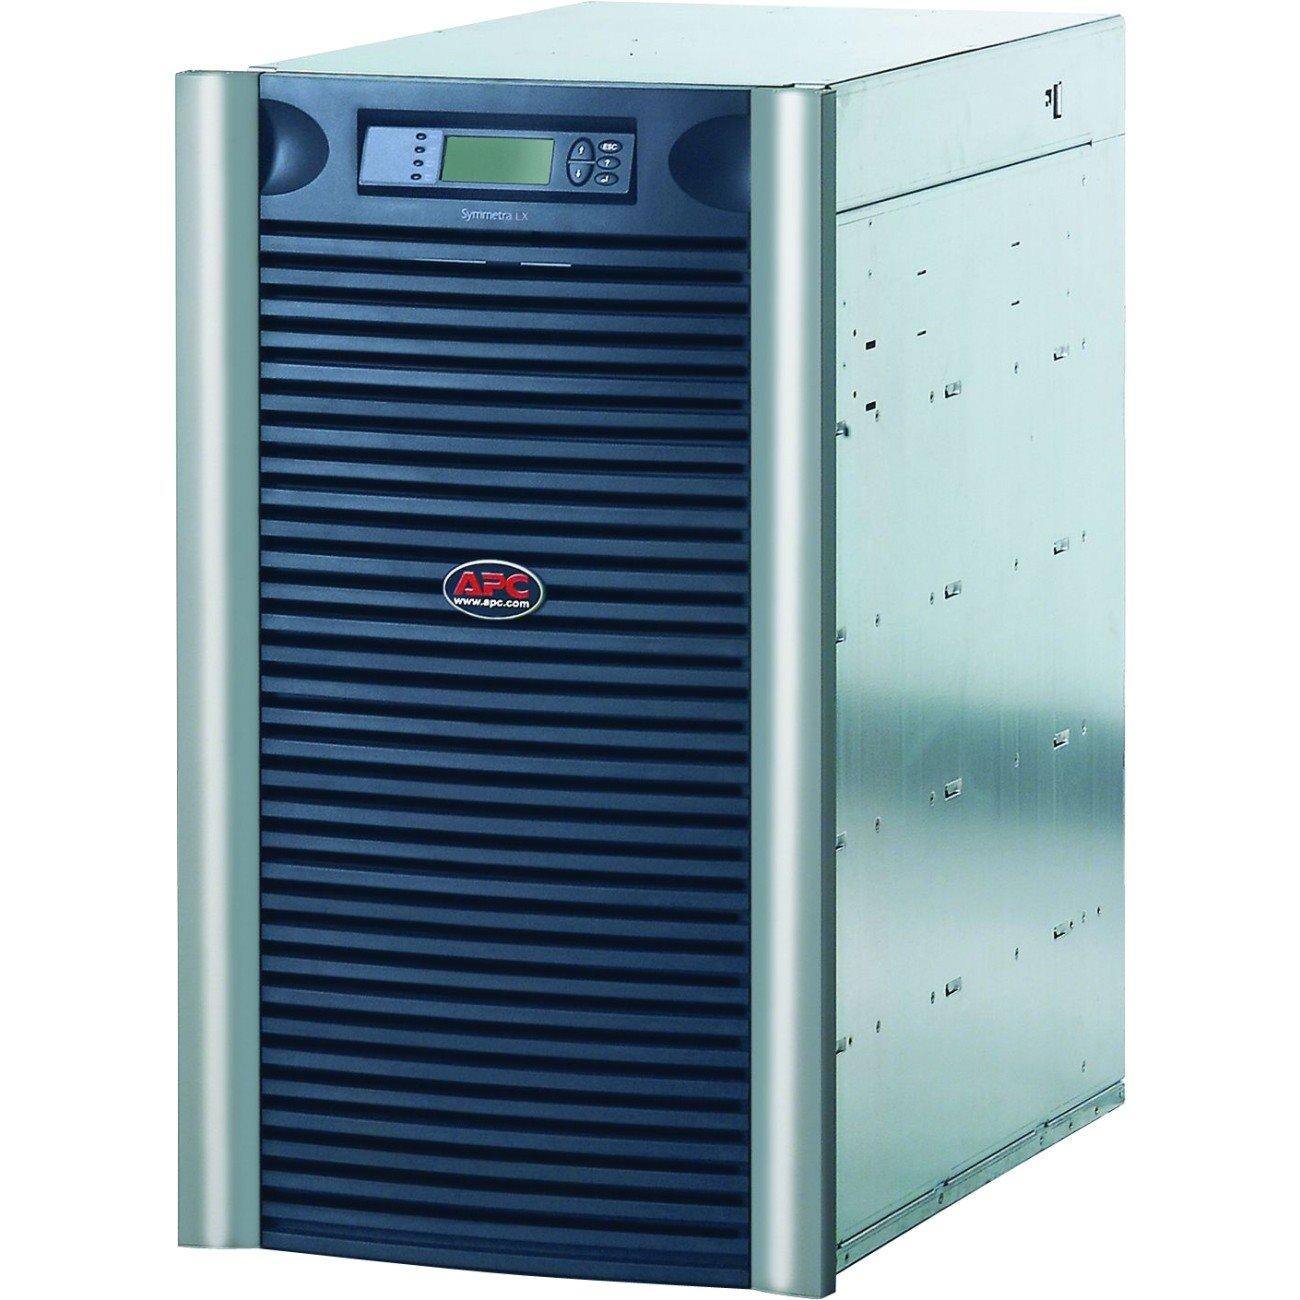 APC by Schneider Electric Symmetra SYA16K16RMI Dual Conversion Online UPS